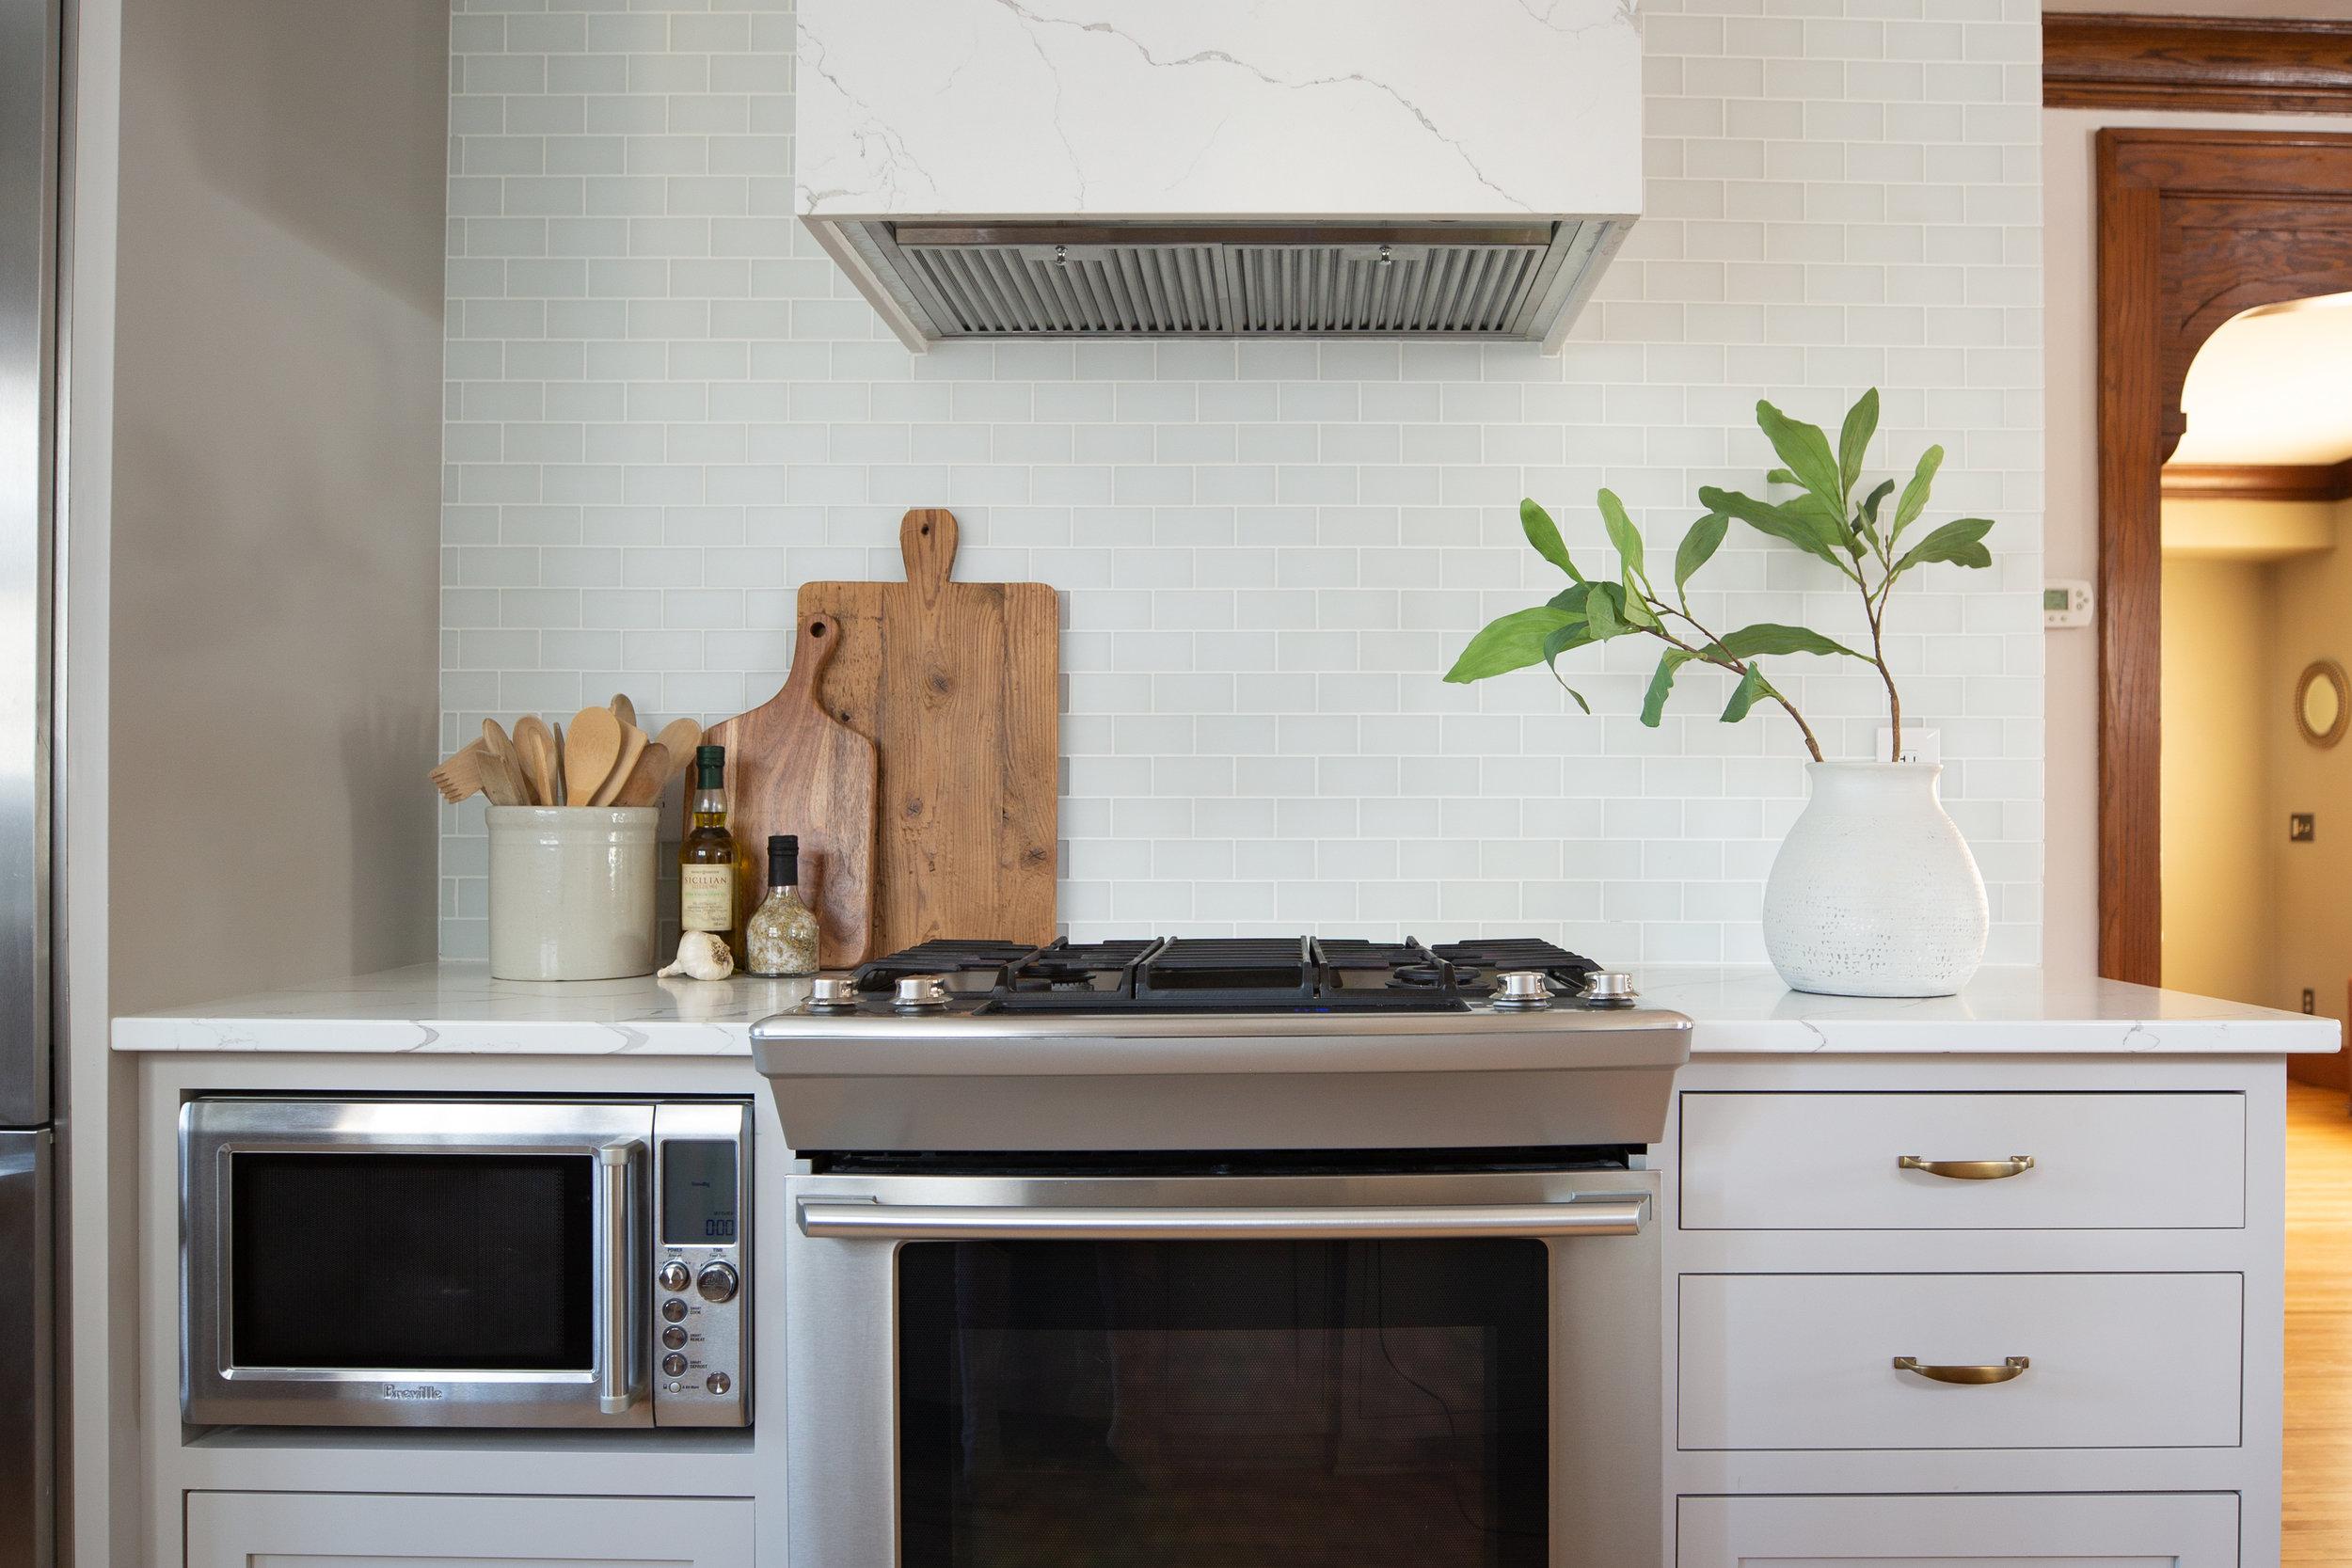 20190130Kassina_Kitchen-030.jpg